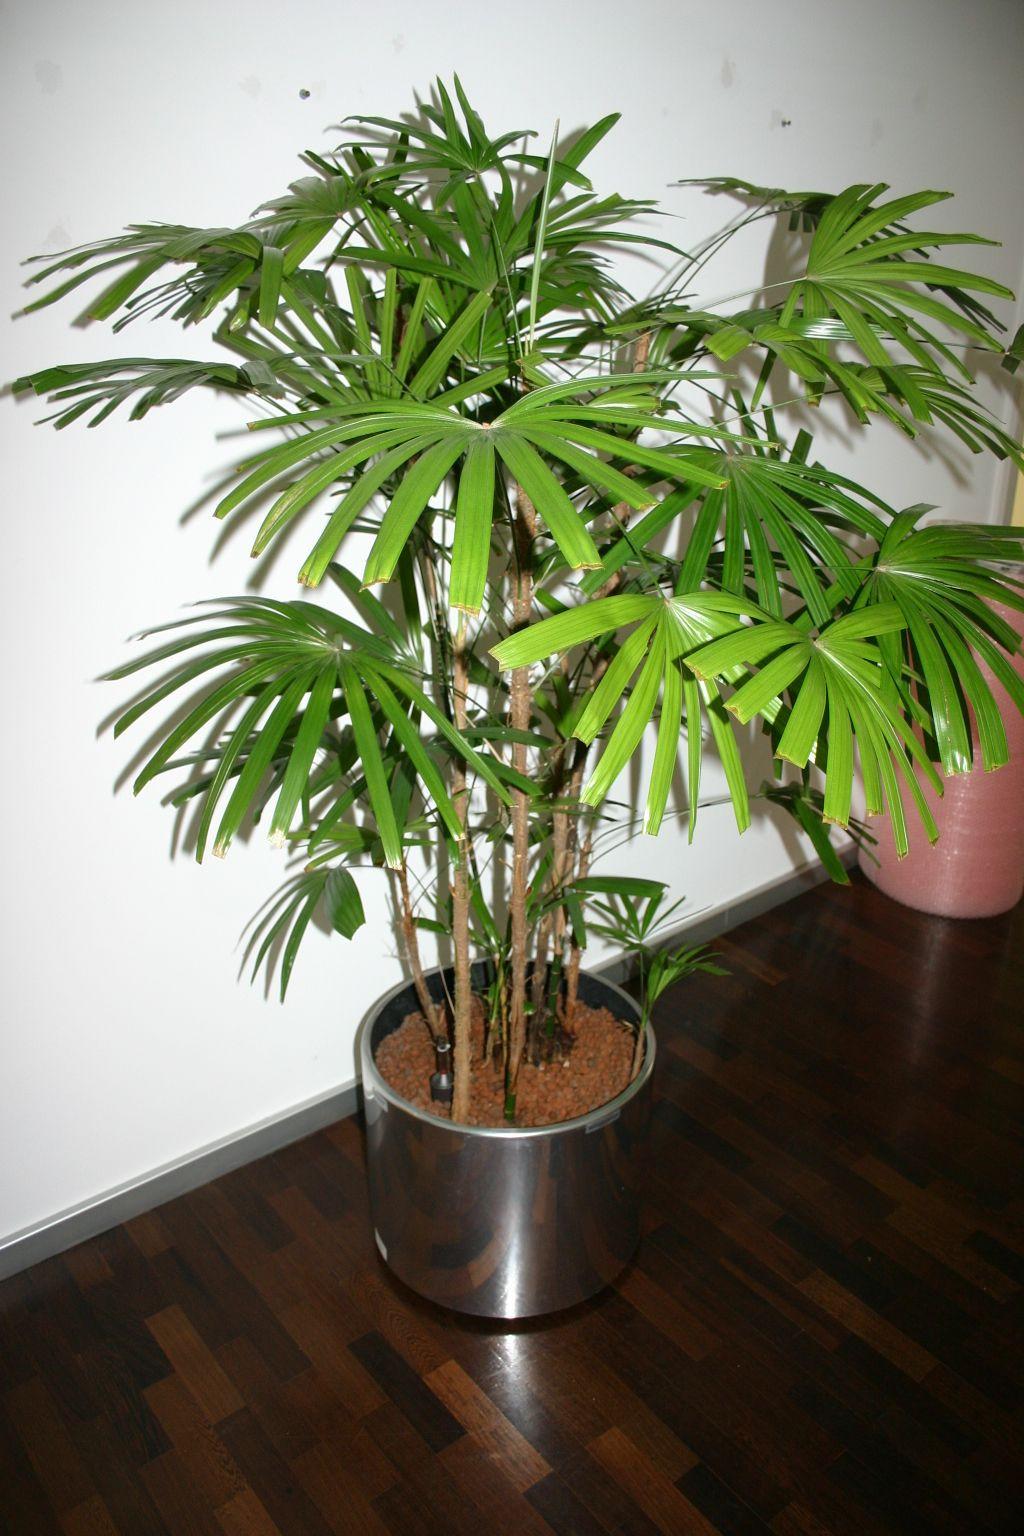 dekorative pflanze hanfpalme mit edelstahltopf sonstige b roausstattung unsere kategorien. Black Bedroom Furniture Sets. Home Design Ideas